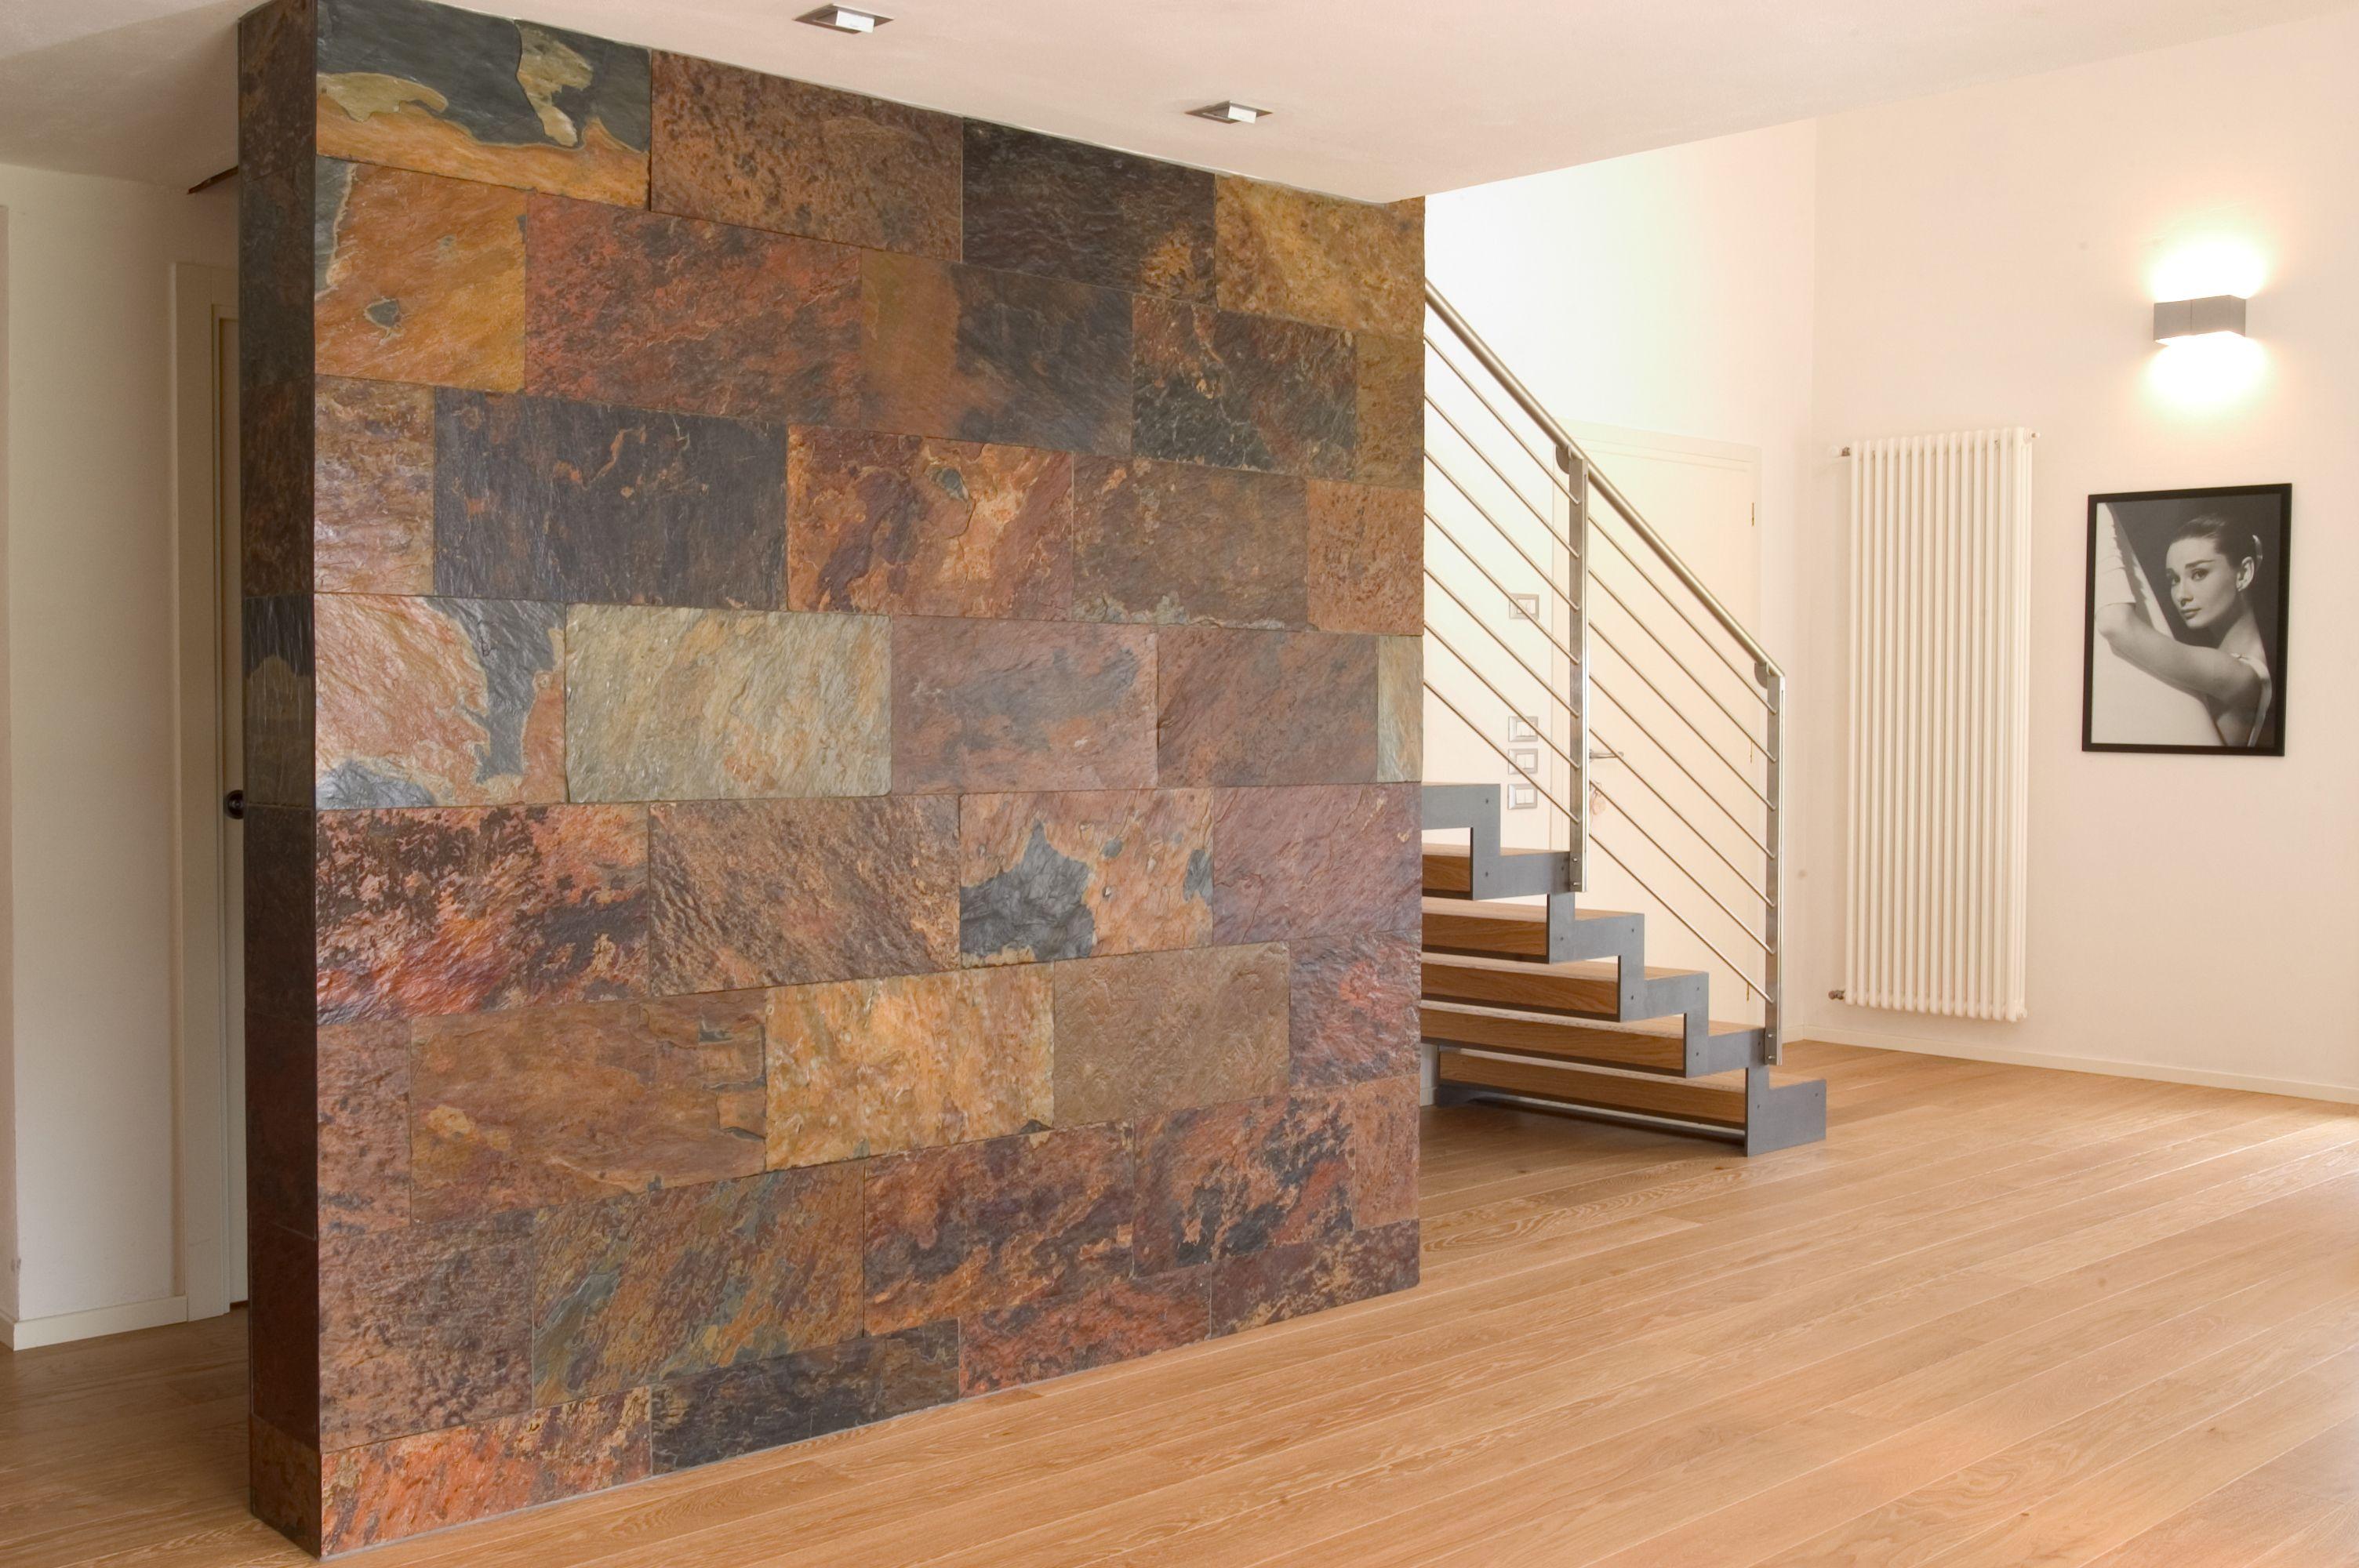 Revestimiento de pared suelo de piedra african sunset l nea artesia by artesia international - Revestimiento paredes imitacion piedra ...